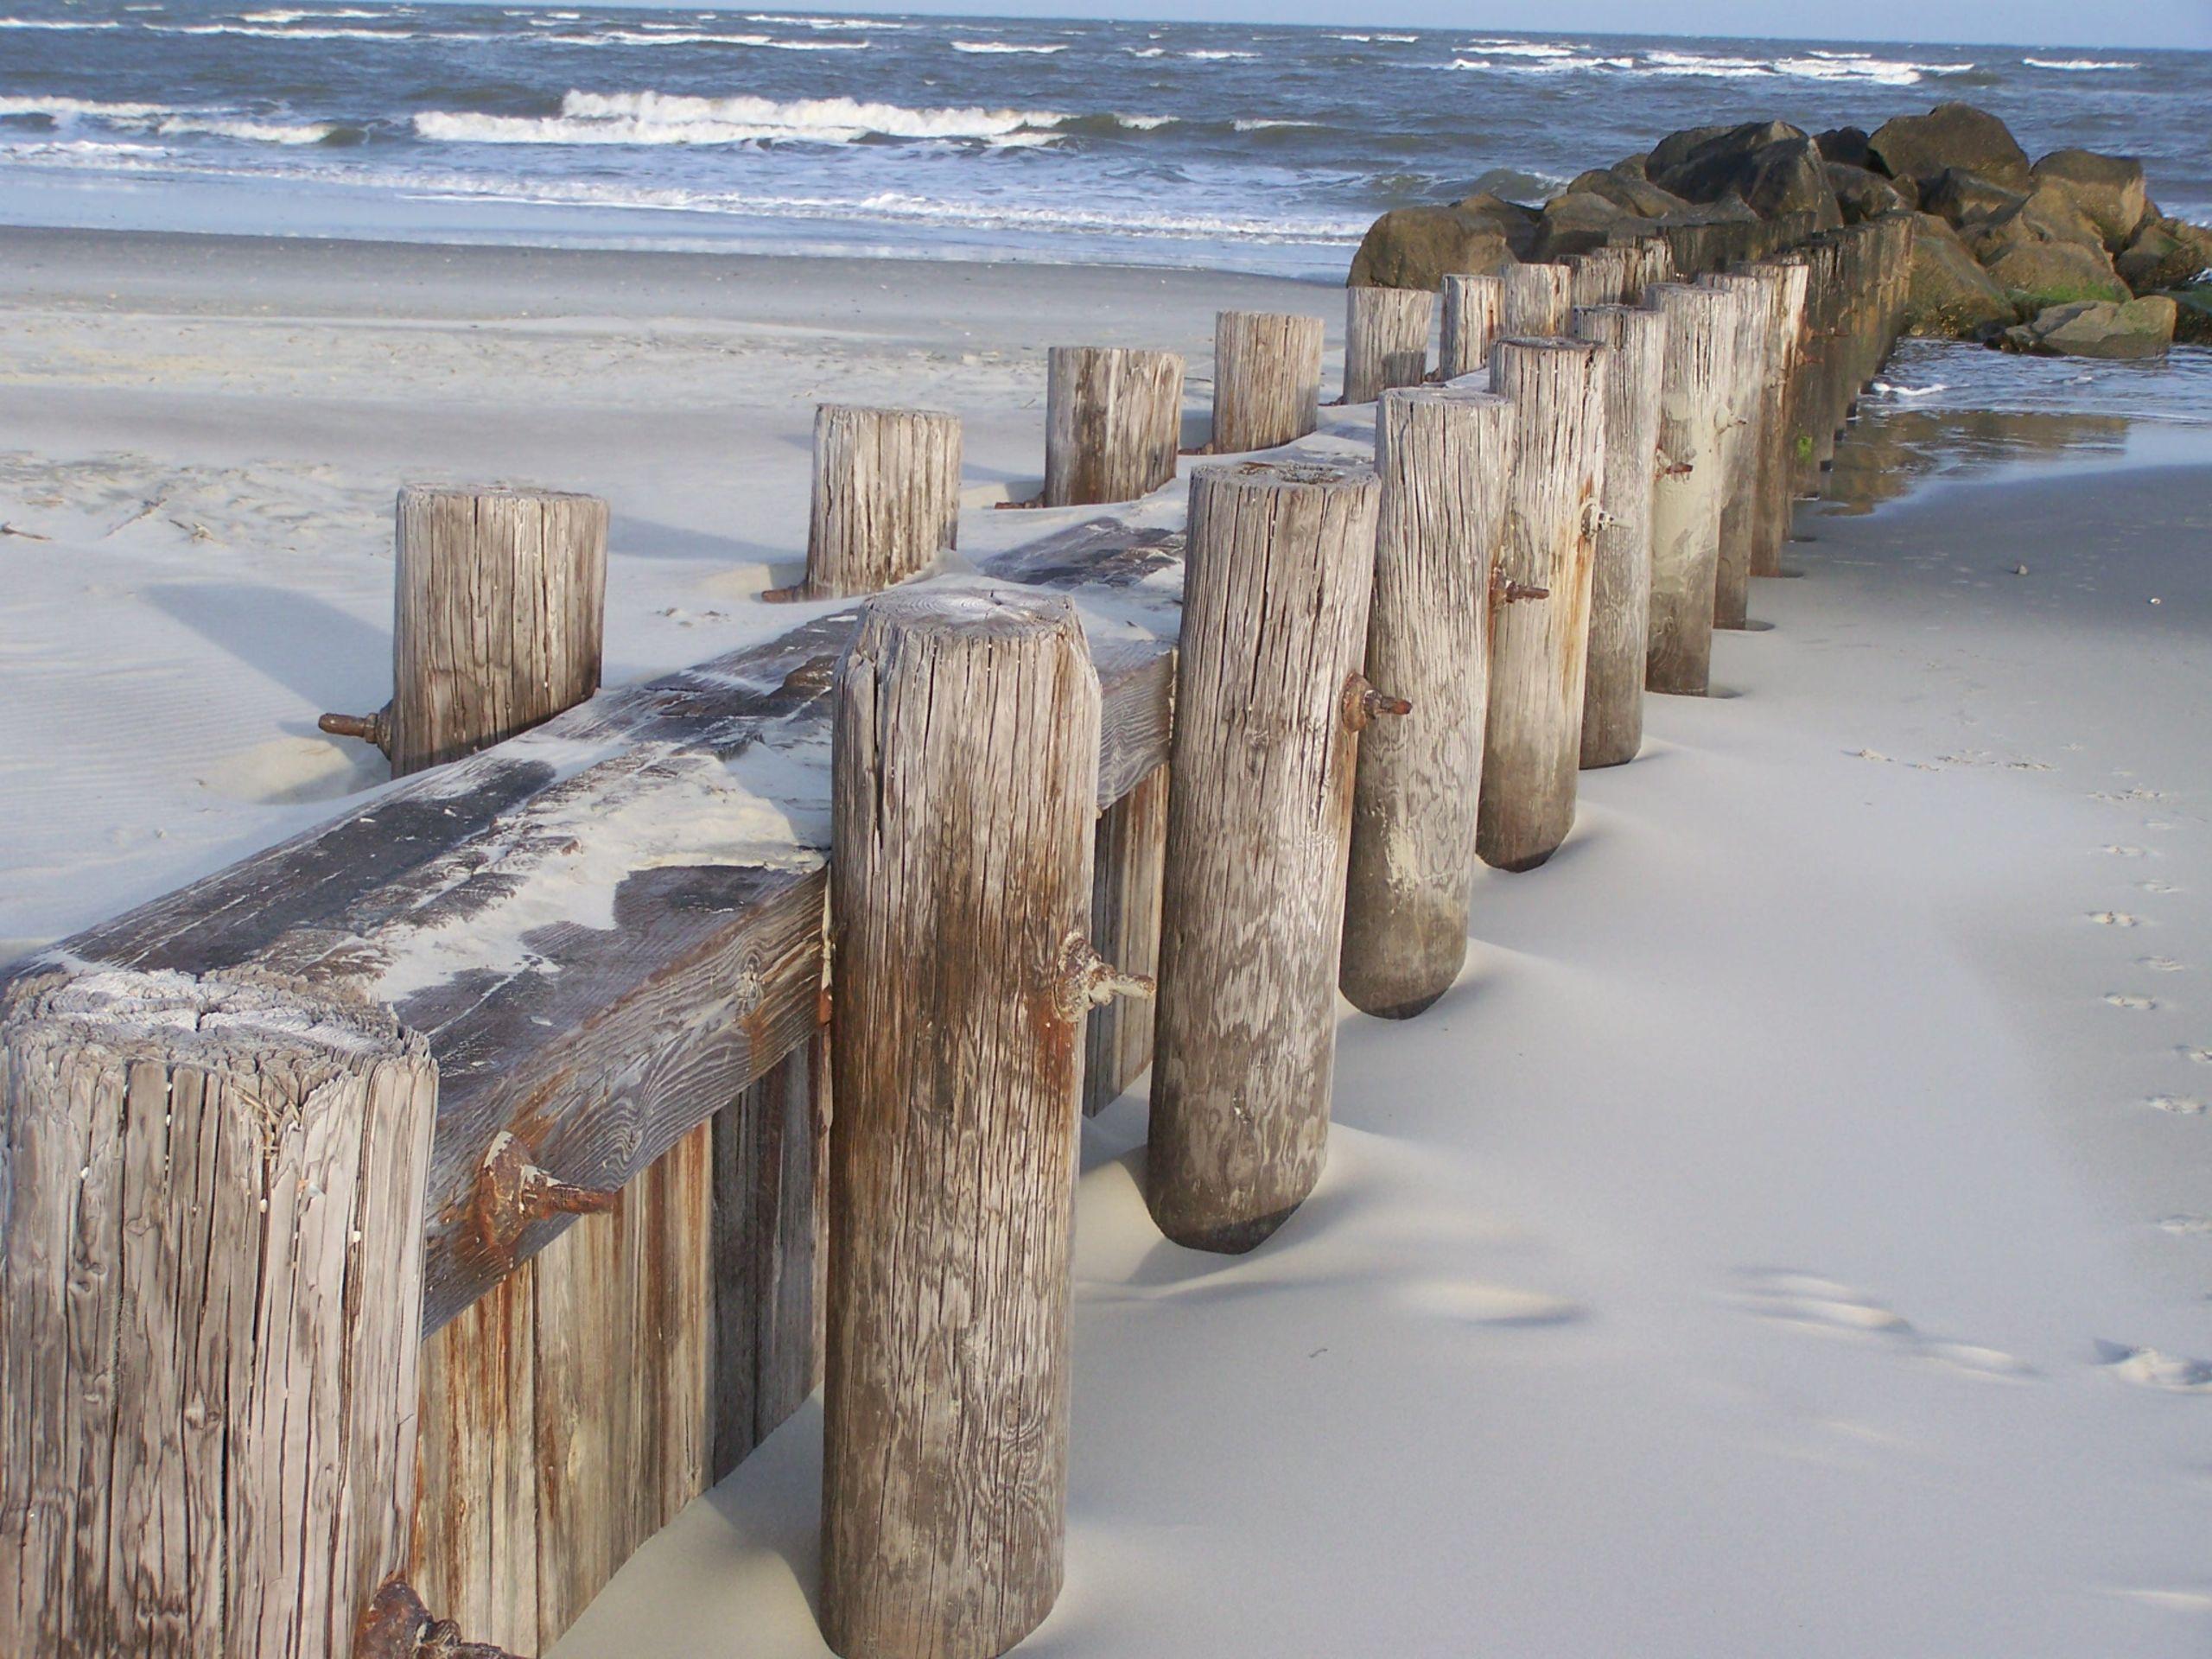 Folly Beach Jetties